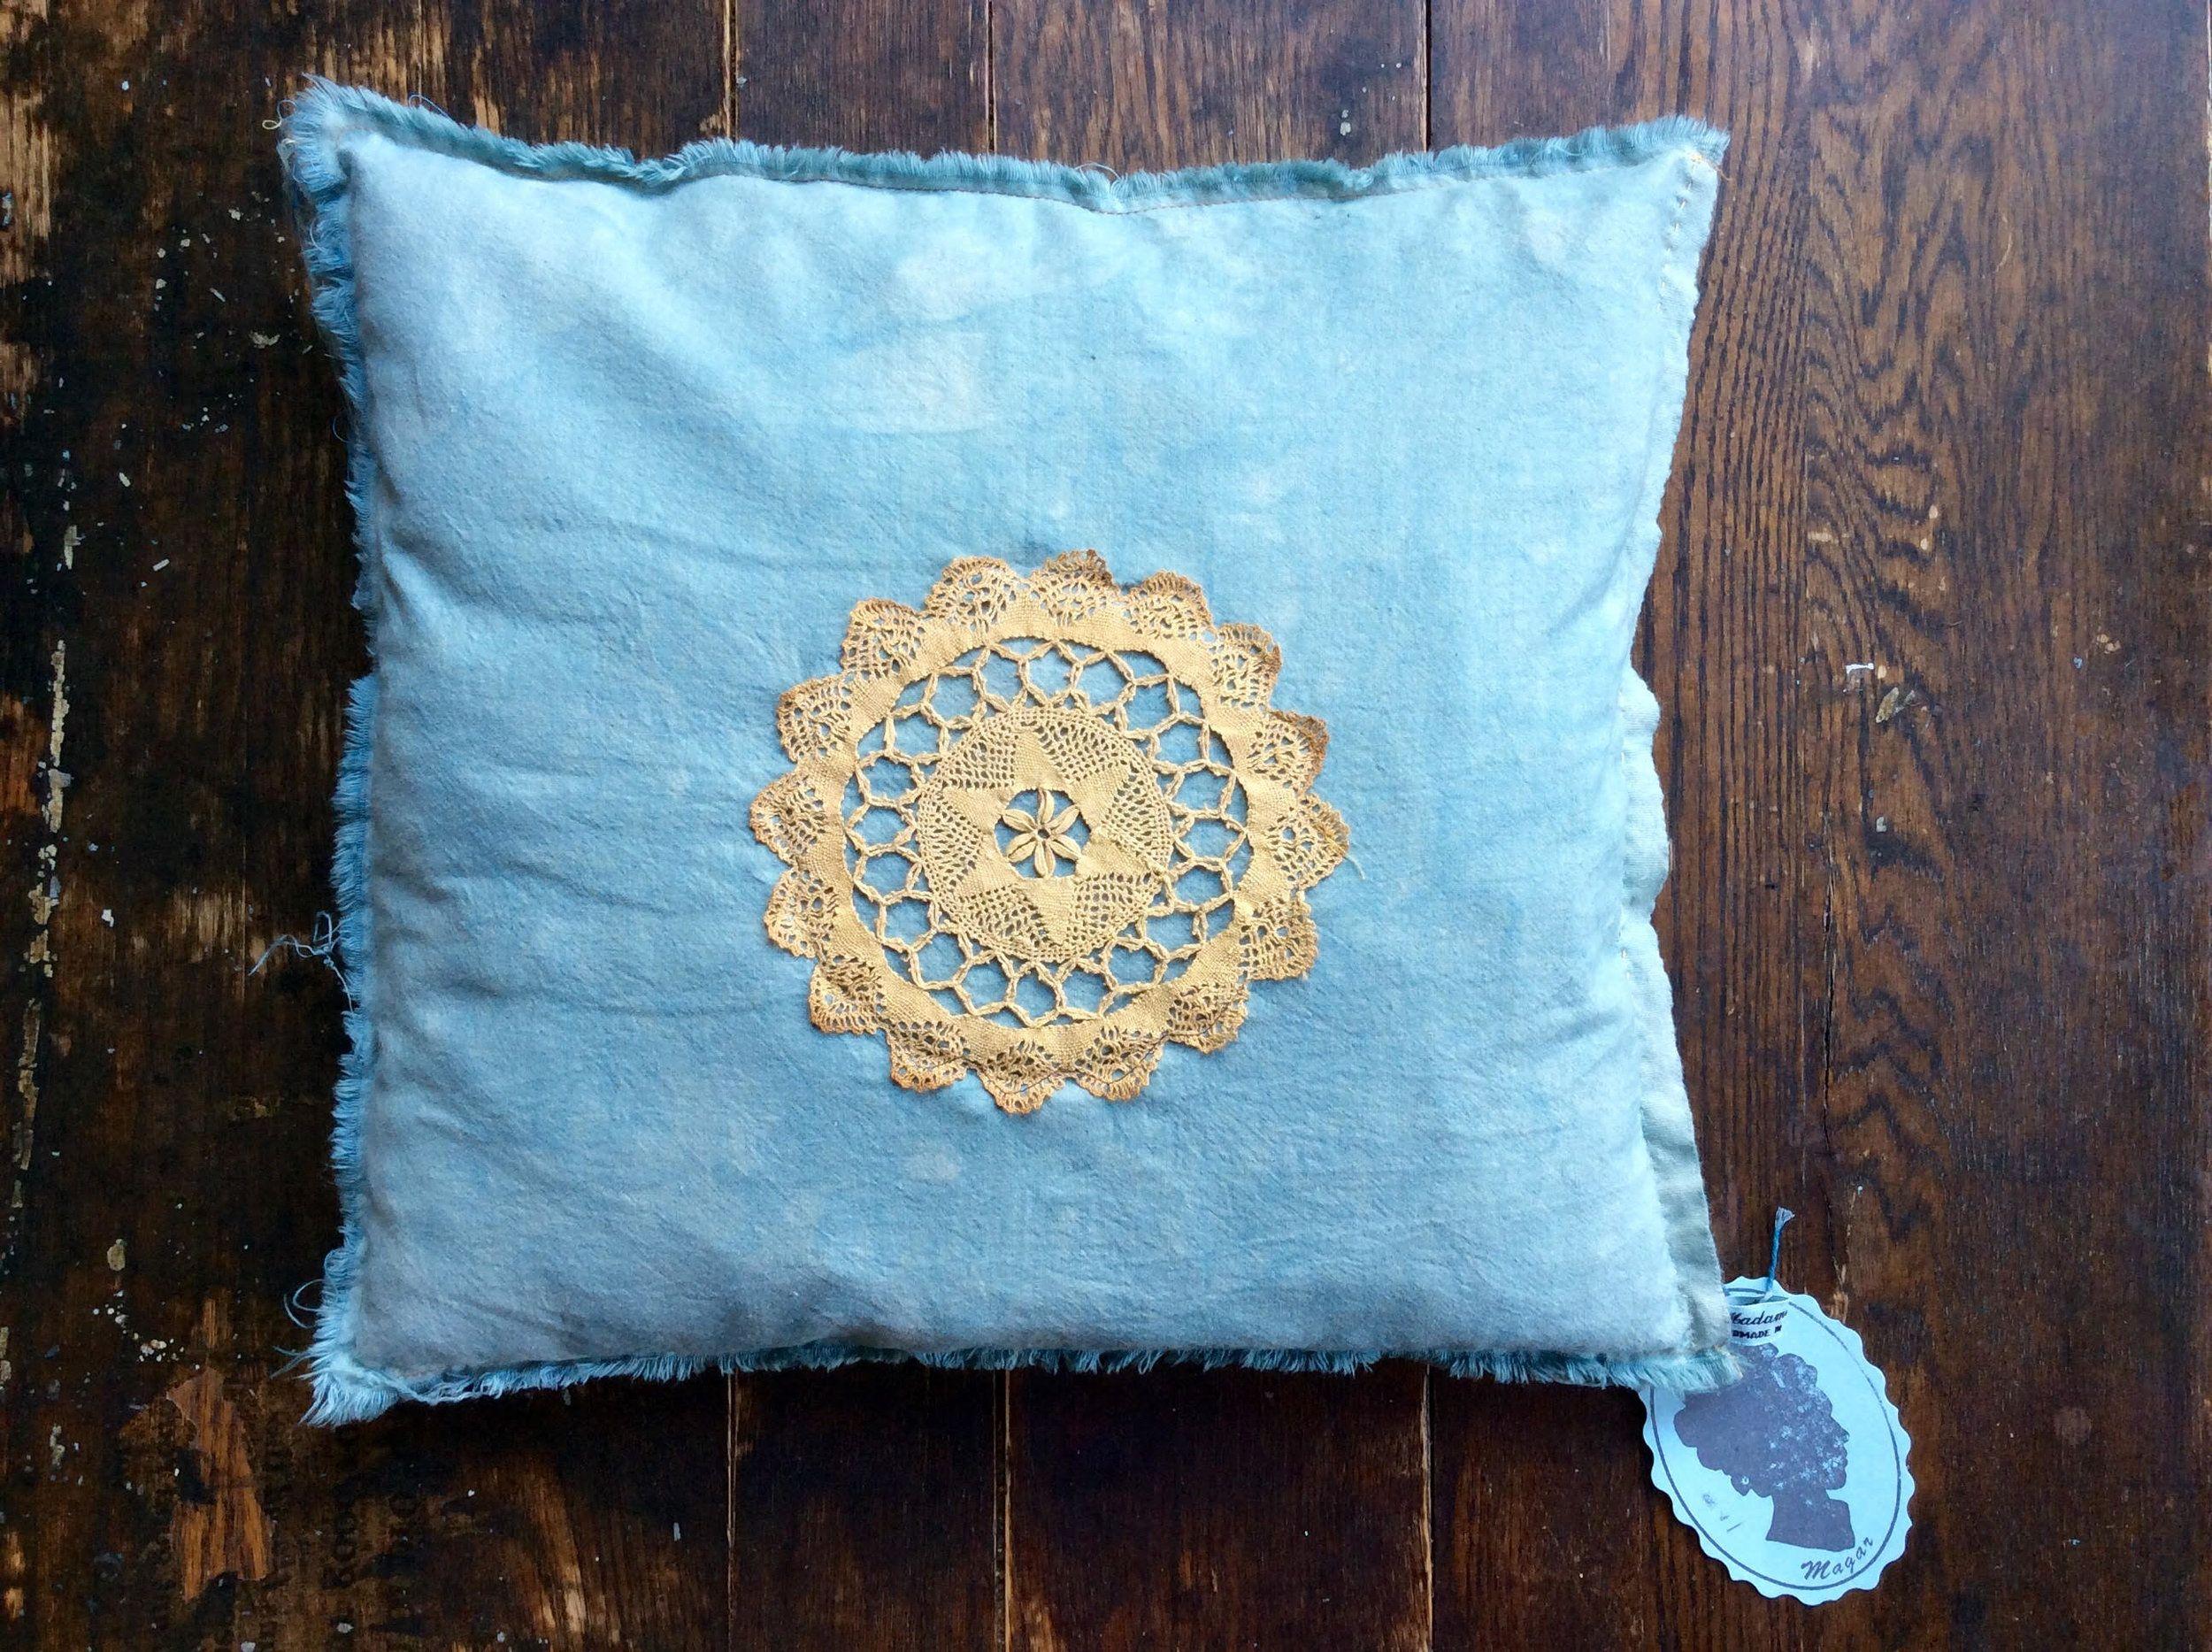 tag pillows goods about t all er aren tell dsc pillow home it